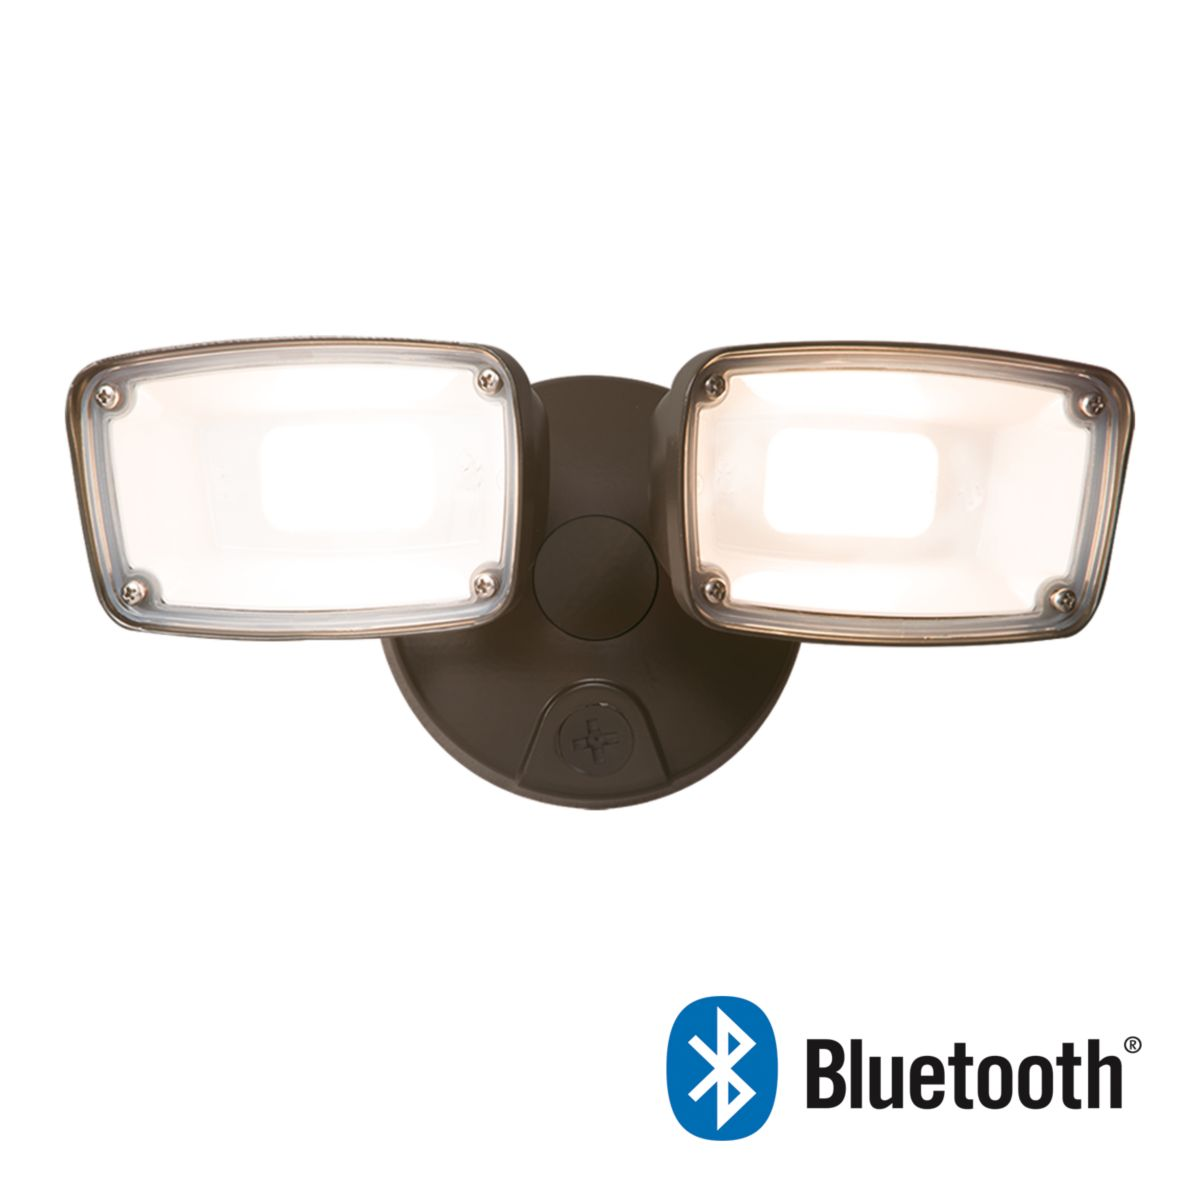 HALO Home Smart Floodlight - FTS20C